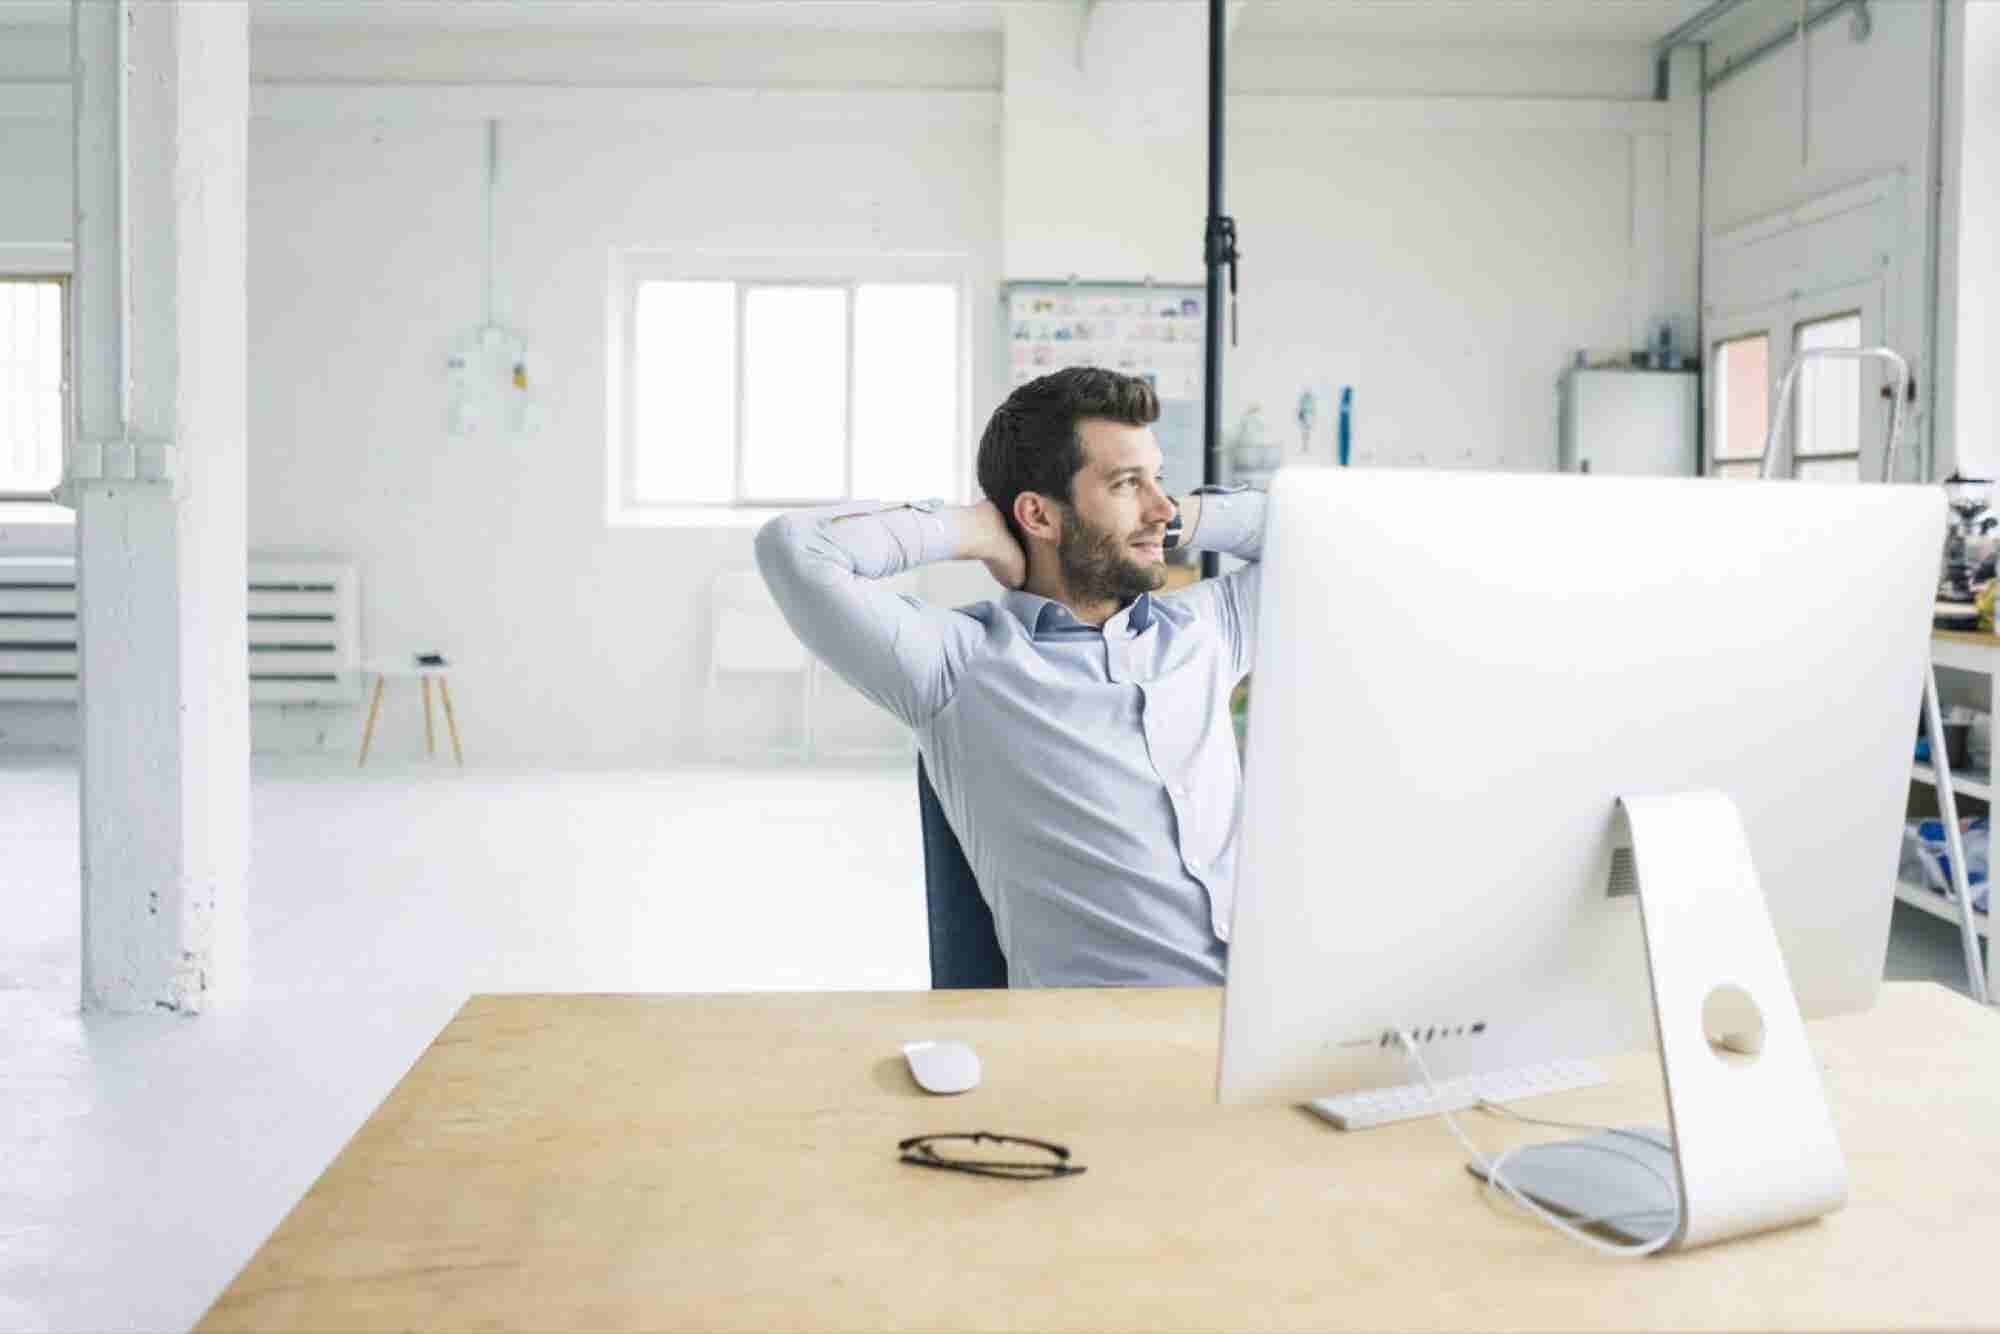 The 'I'm My Own Boss' Myth Humbles Many an Entrepreneur